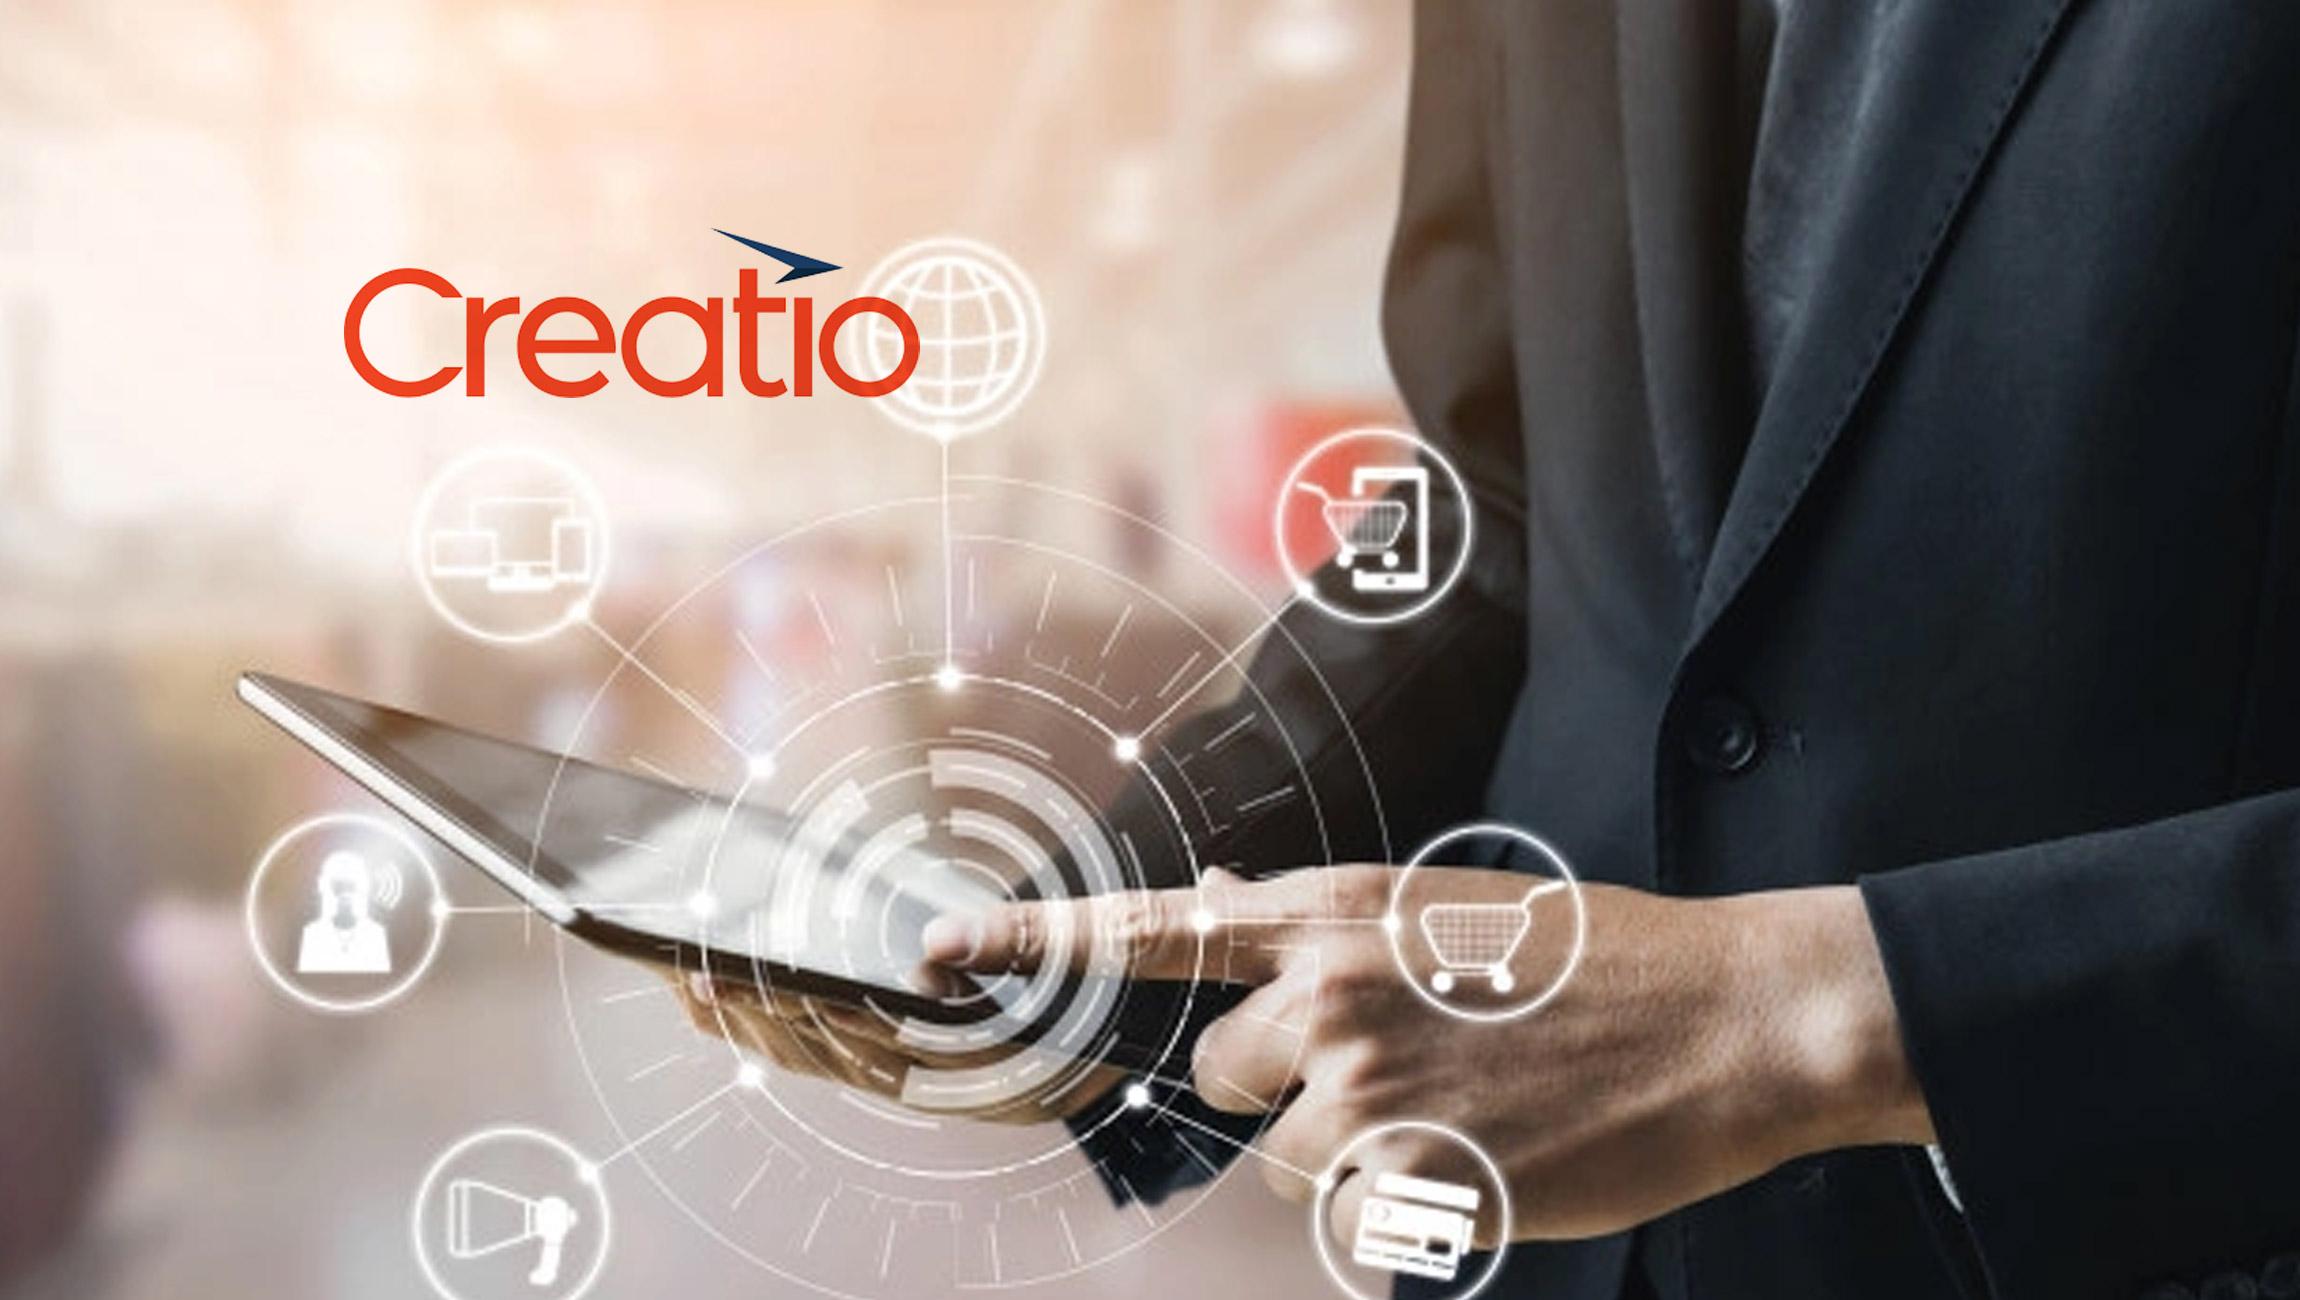 Creatio Announces Hackathon to Highlight the Power of No-code for Application Development